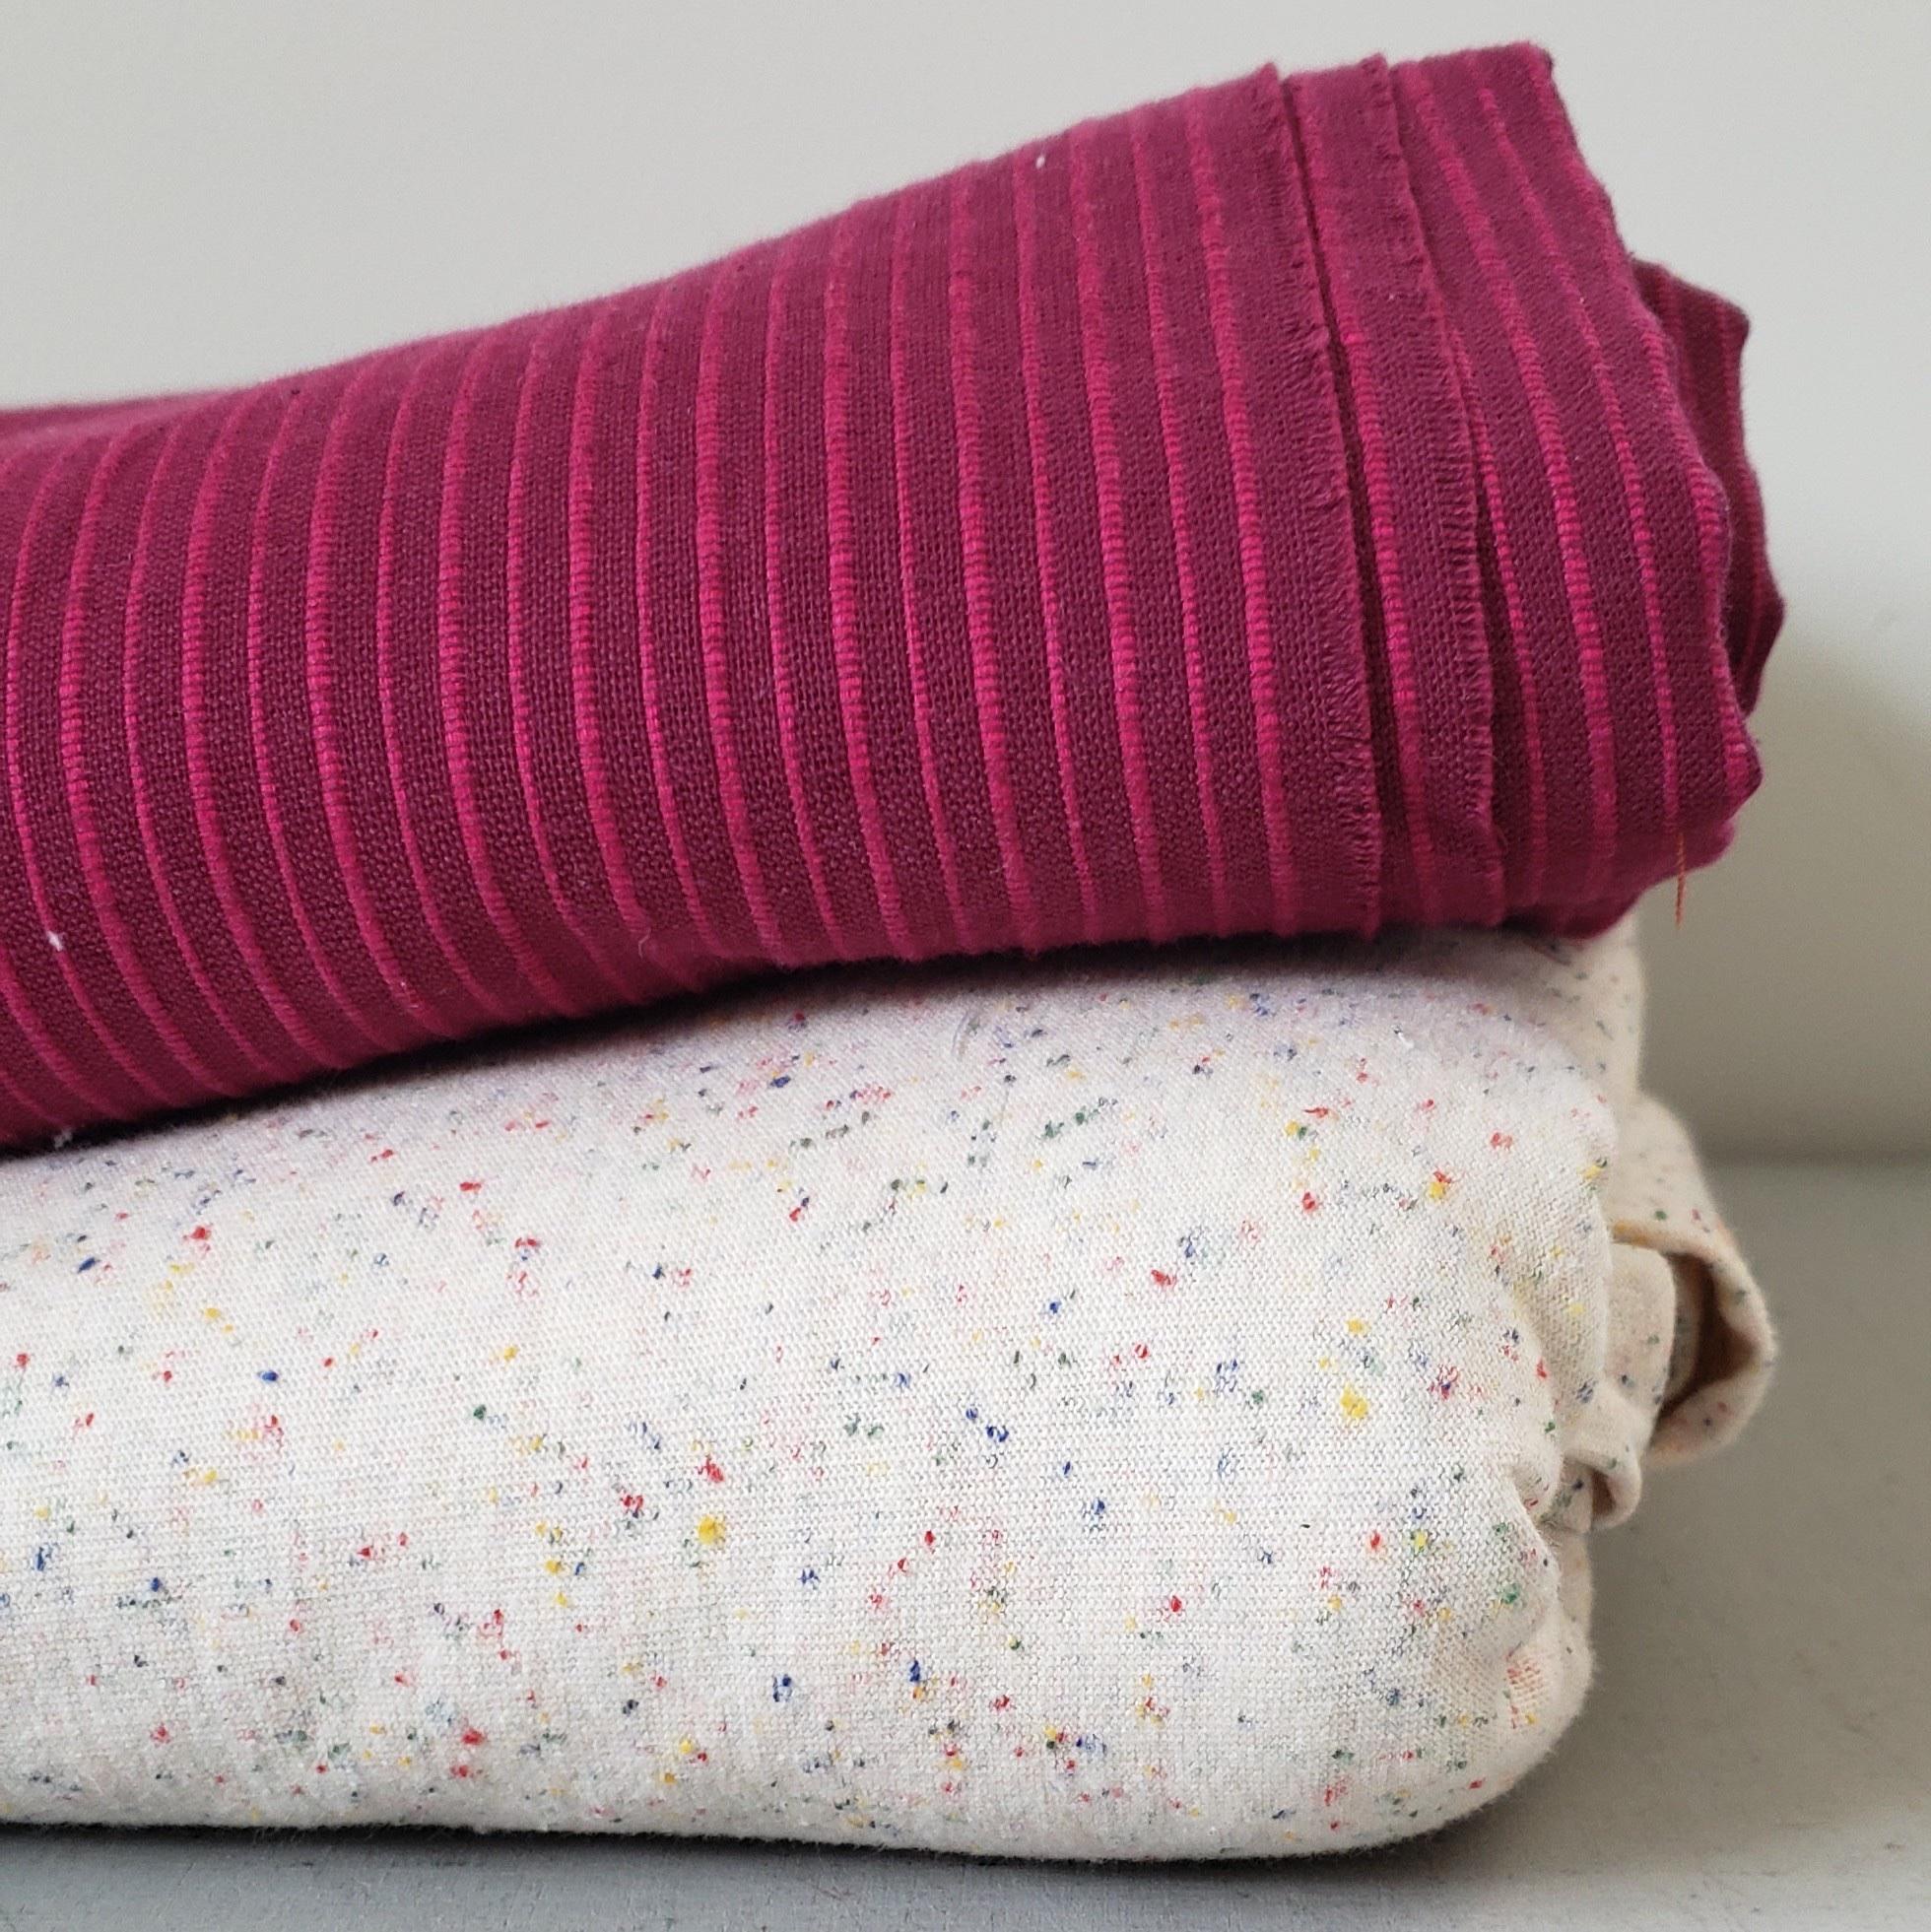 Kalle Shirtdress fabric